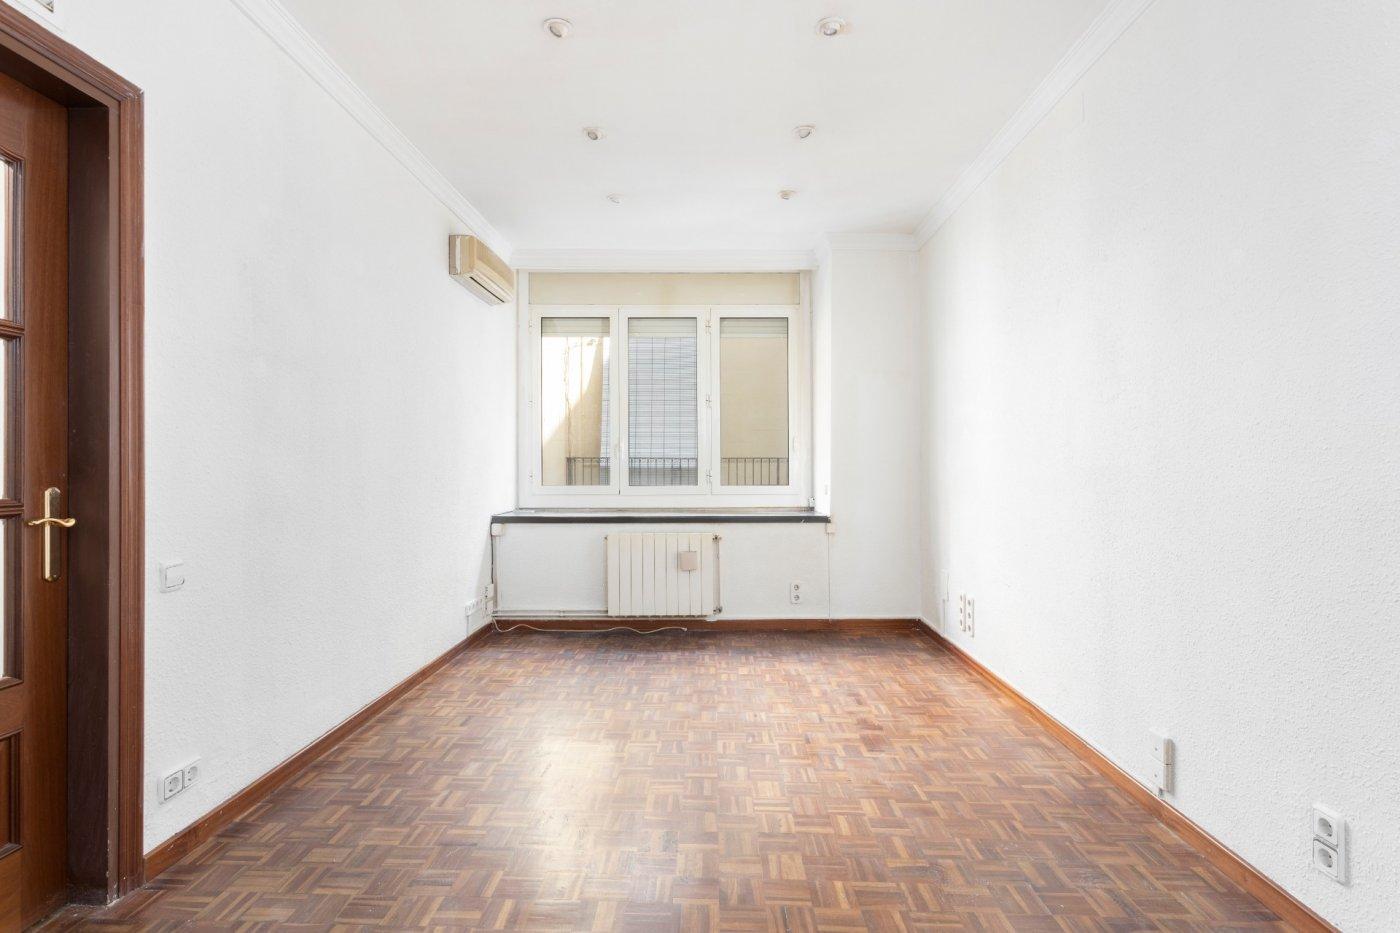 Flat for sale in Sarrià, Barcelona